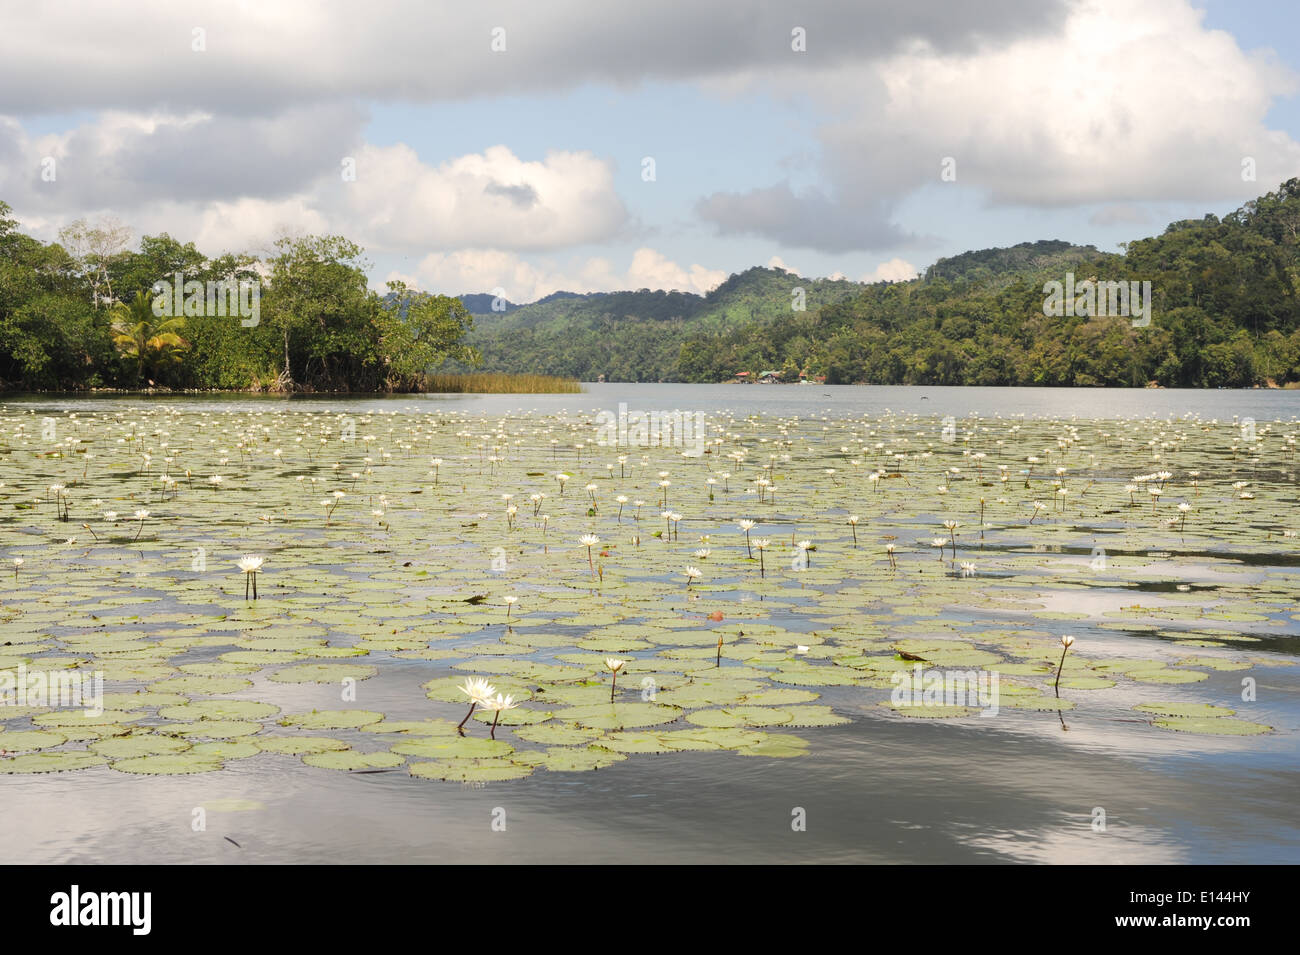 Aquatic flowers at isla de las flores on river Dulce near Livingston on Guatemala - Stock Image